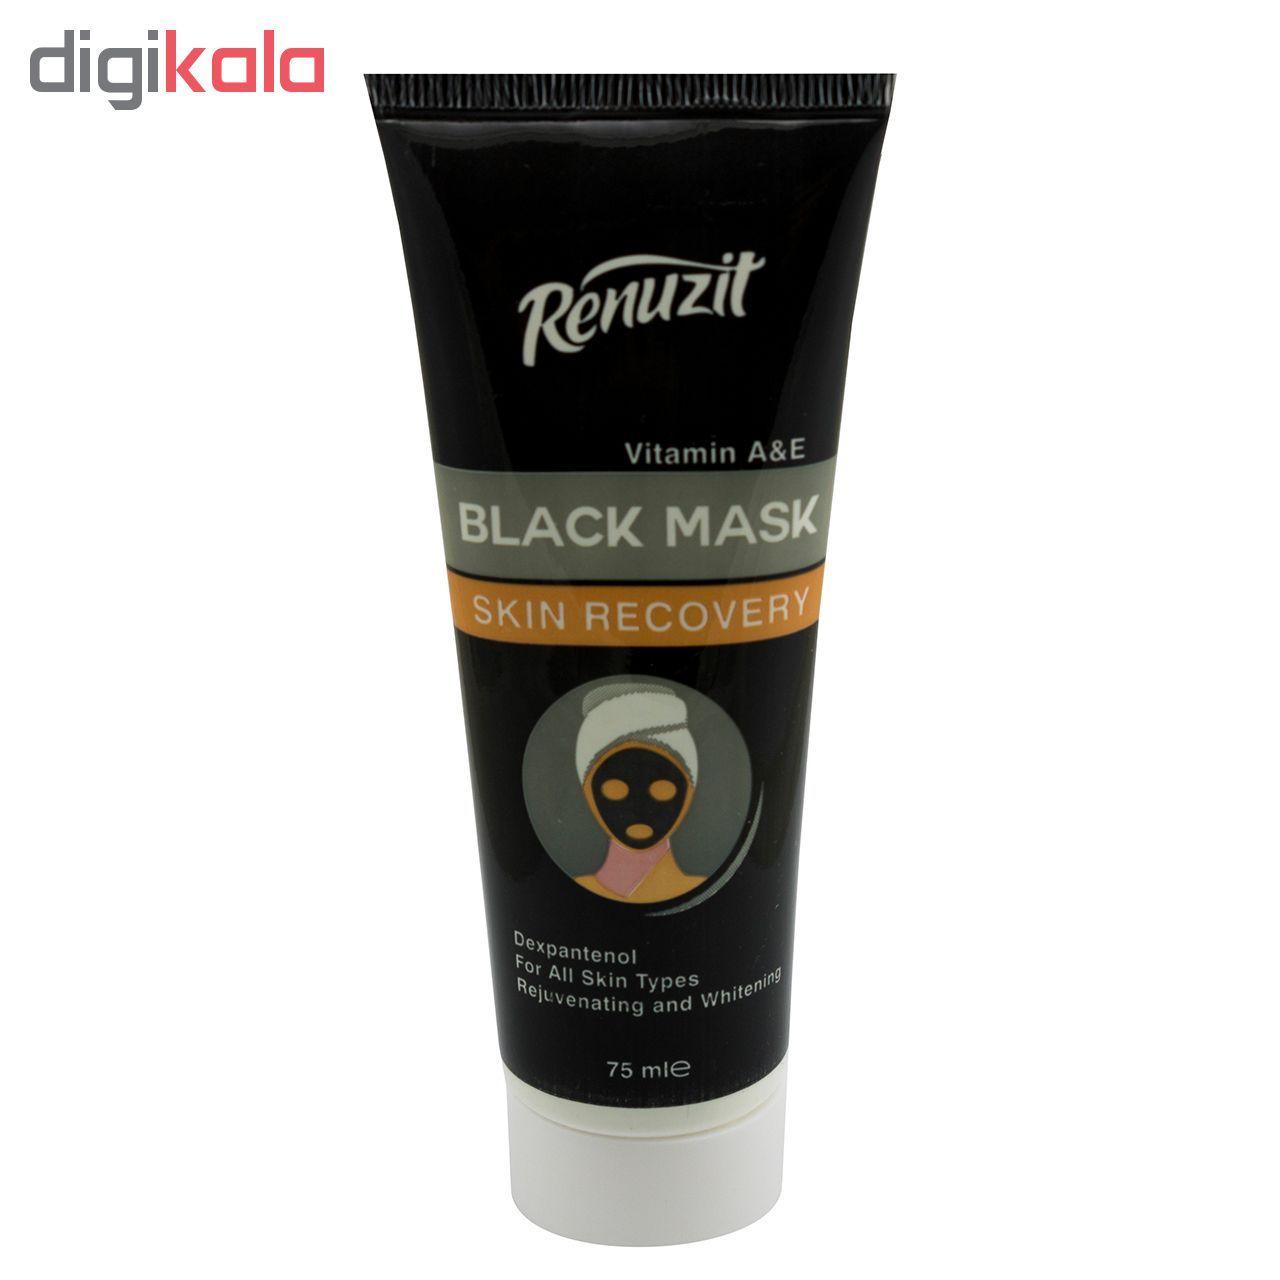 ماسک صورت رینو زیت مدل Black mask carbon active حجم 75 میلی لیتر مجموعه 2 عددی main 1 2